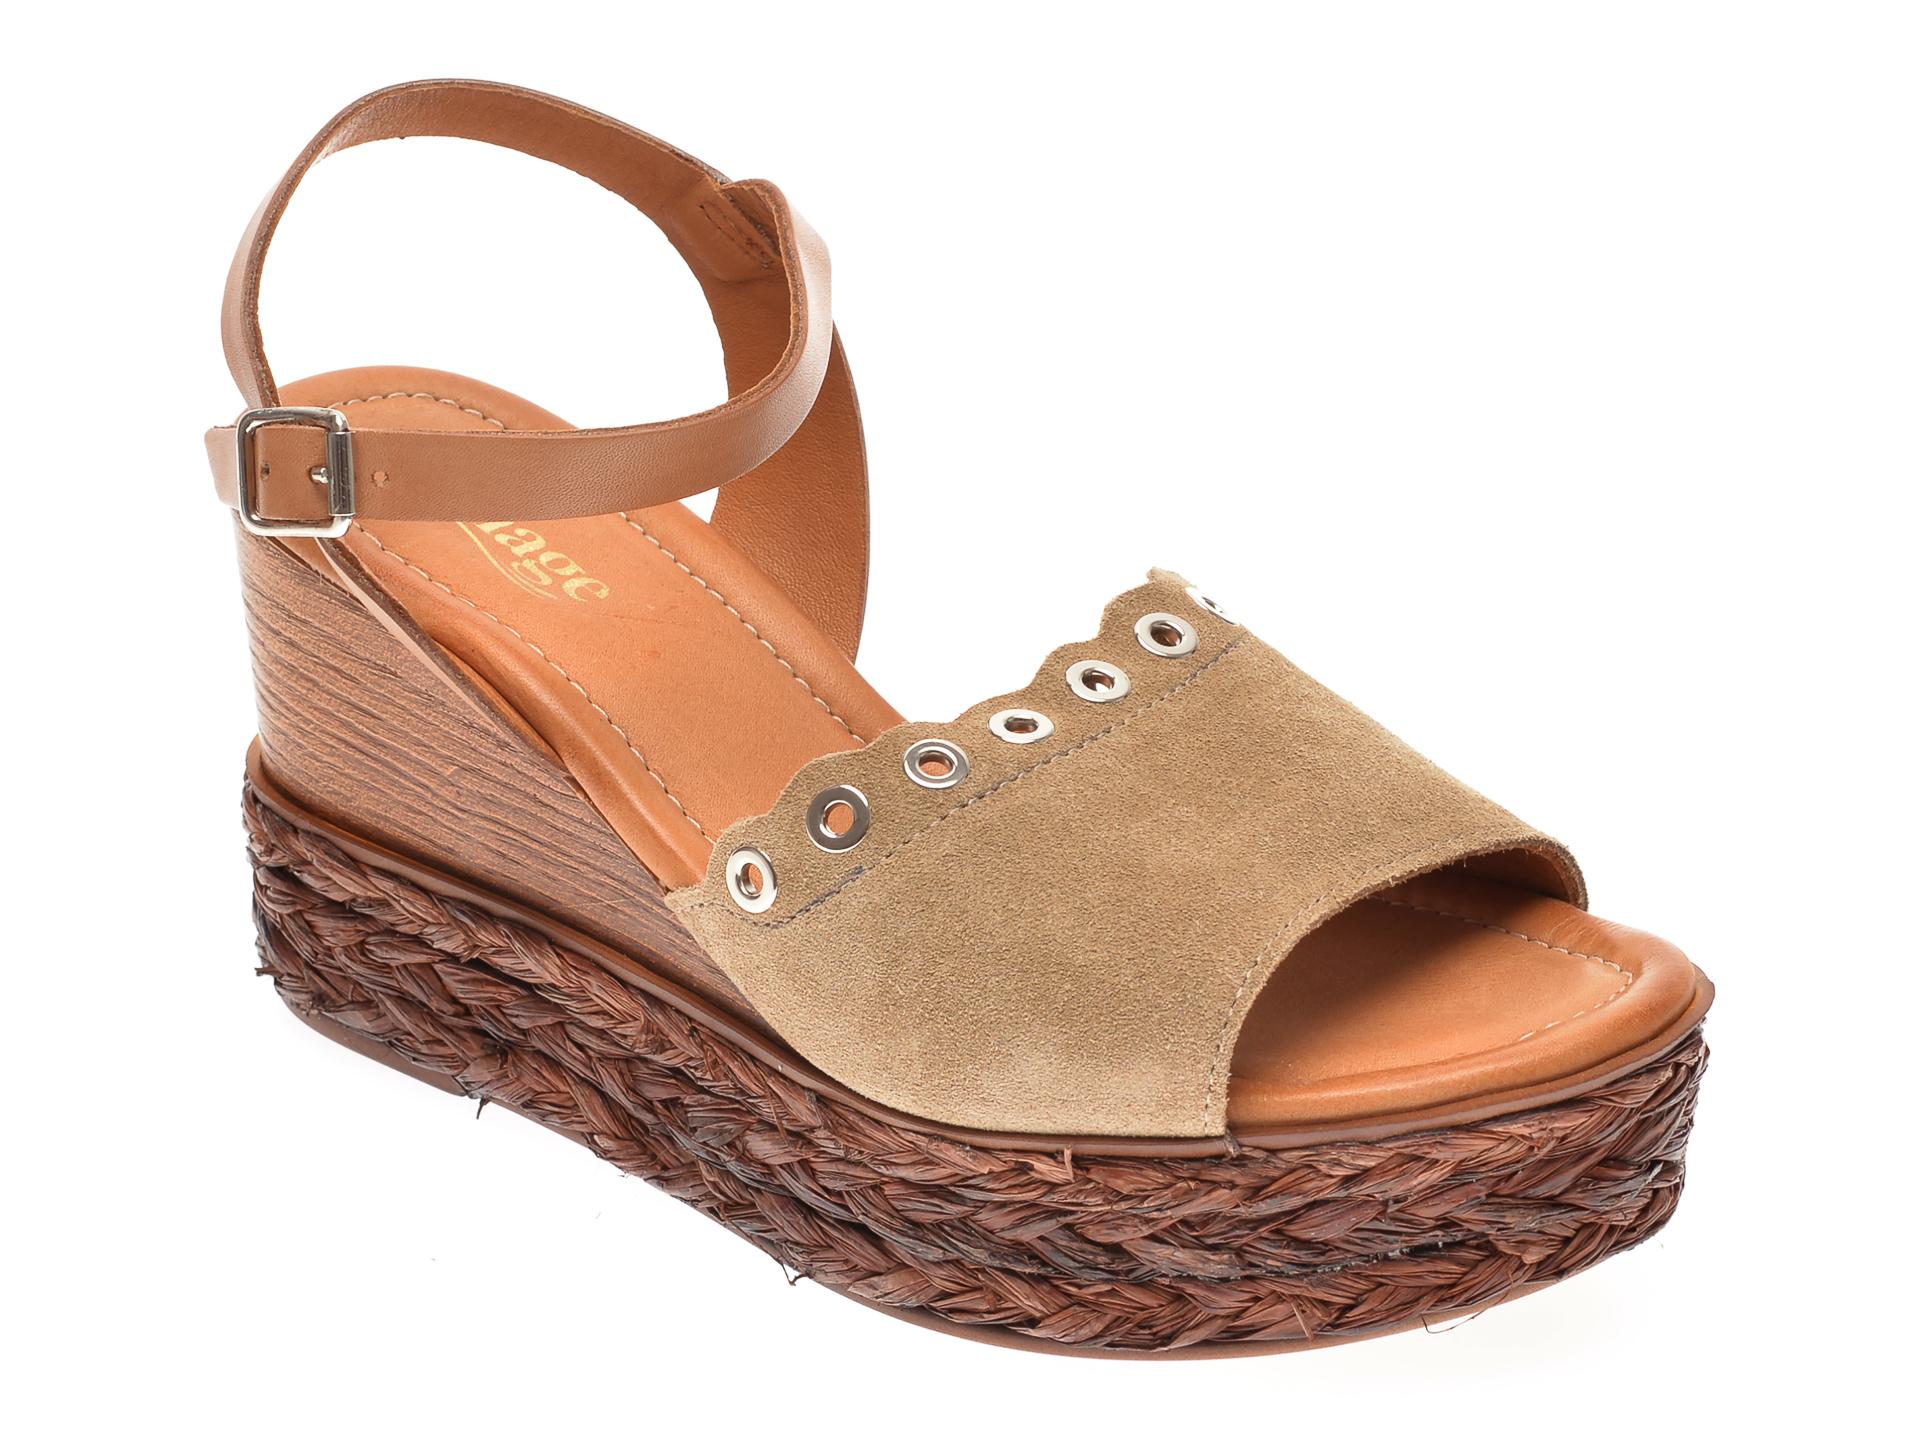 Sandale Image Bej, 4151, Din Piele Intoarsa